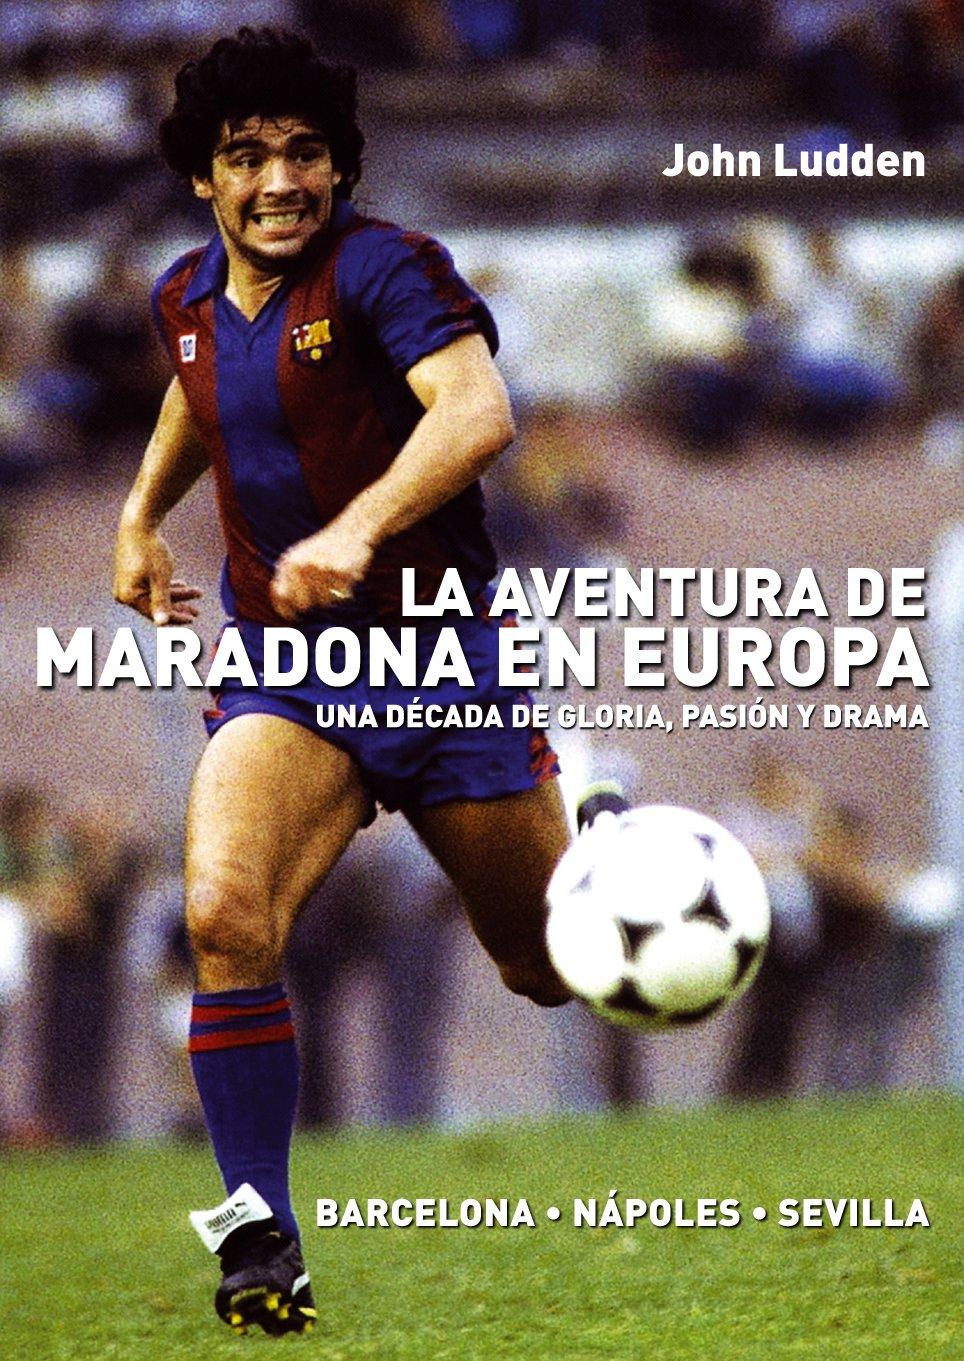 La aventura de Maradona en Europa: Barcelona-Nápoles-Sevilla: Amazon.es: John Ludden, Rocio Valero Lucas: Libros